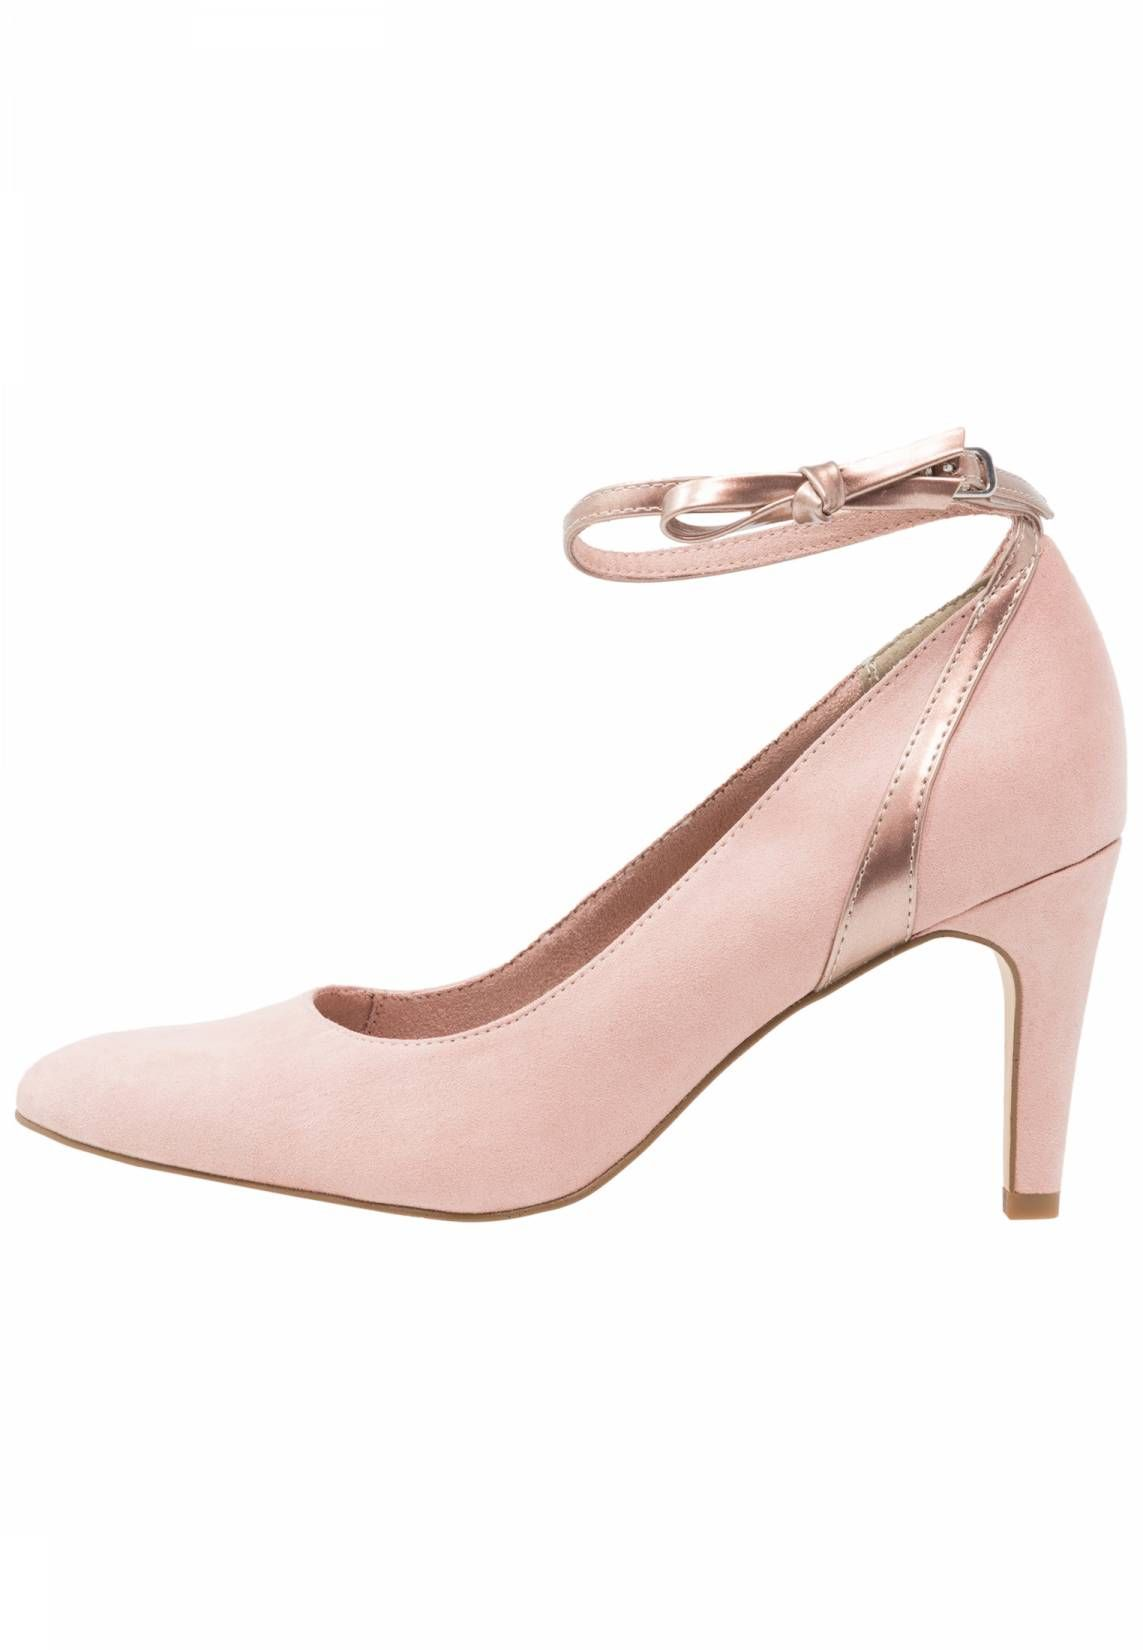 Tamaris Pumps Rose Rose Metallic Sohle Kunststoff Decksohle Lederimitat Innenmaterial Textil Details Zierschl Schuhe Mit Absatz Pumps Rose Tamaris Pumps